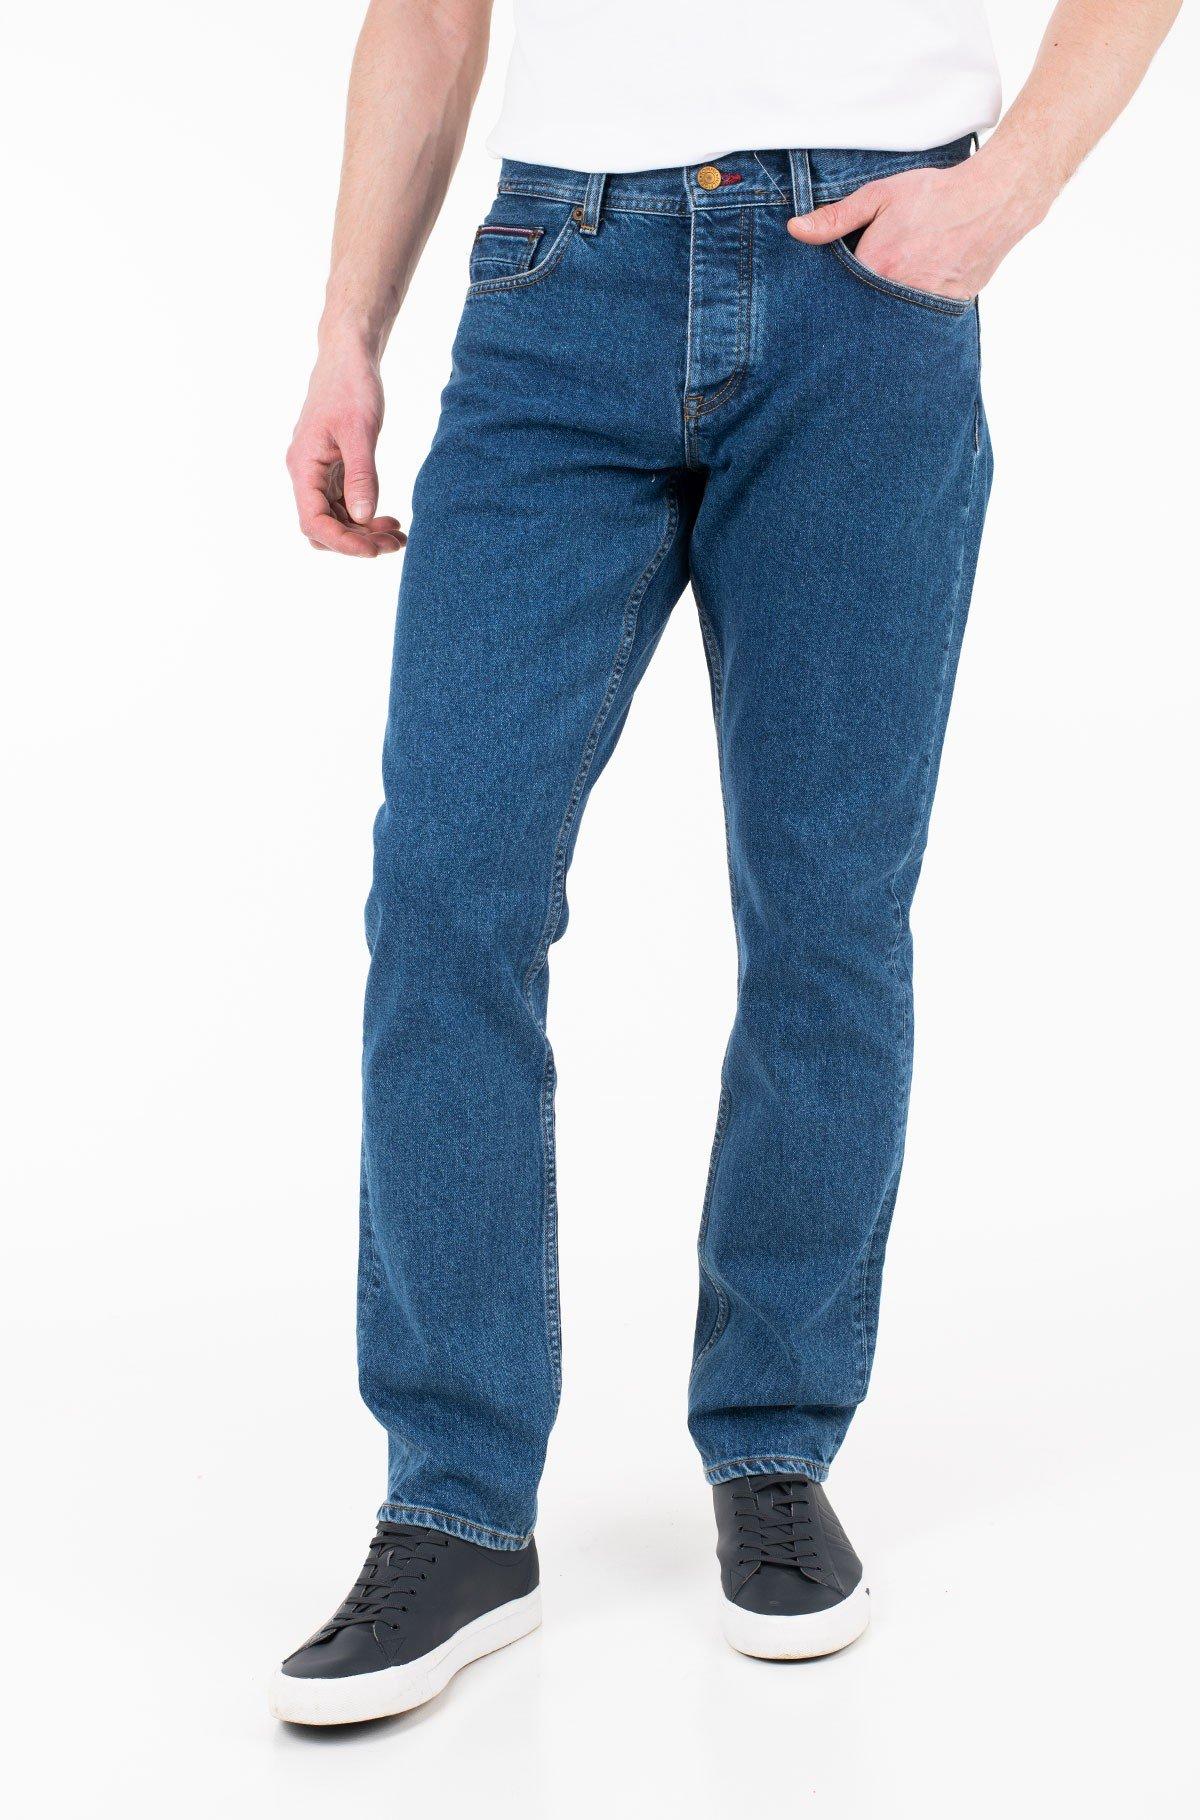 c423b8b52 Blue 2 Jeans ICON REGULAR MERCER STR 90S STN Tommy Hilfiger, Mens ...